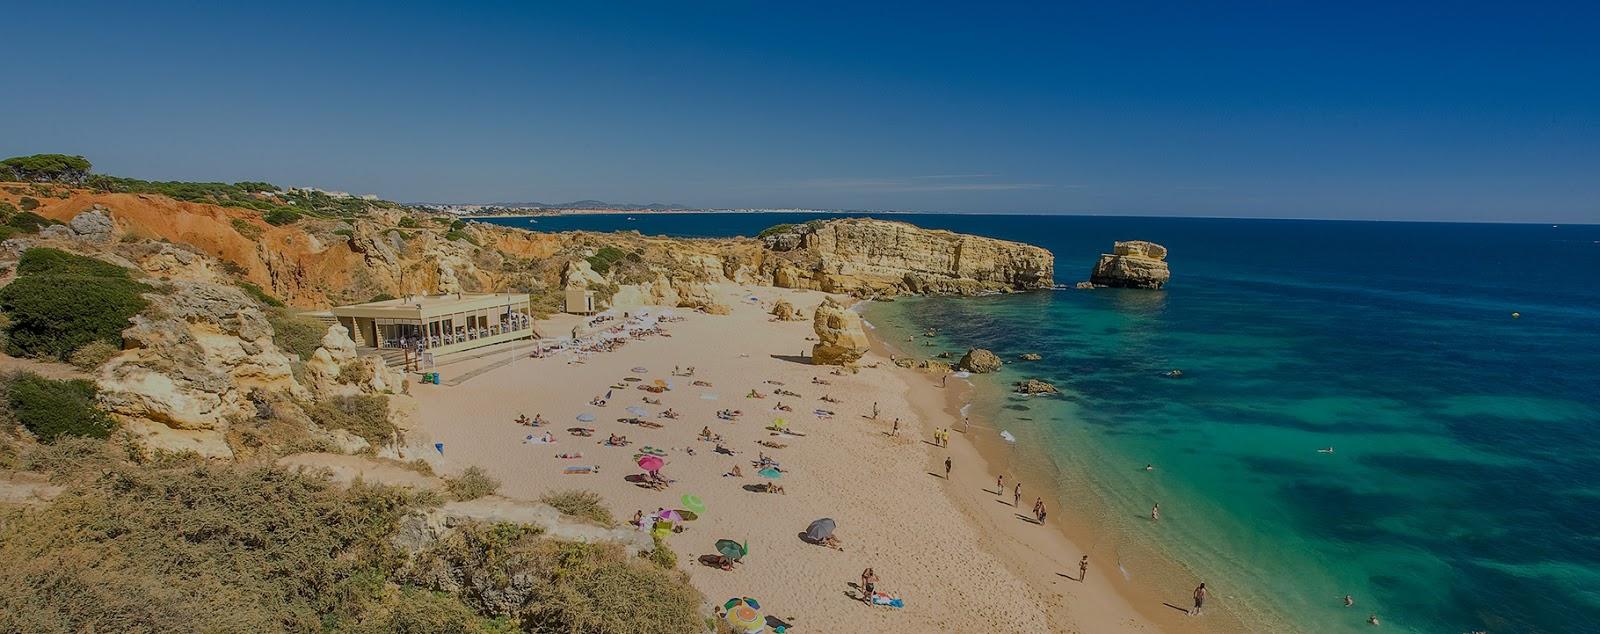 Nau São Rafael Atlântico Discover The Algarve Beach Hotel Shark